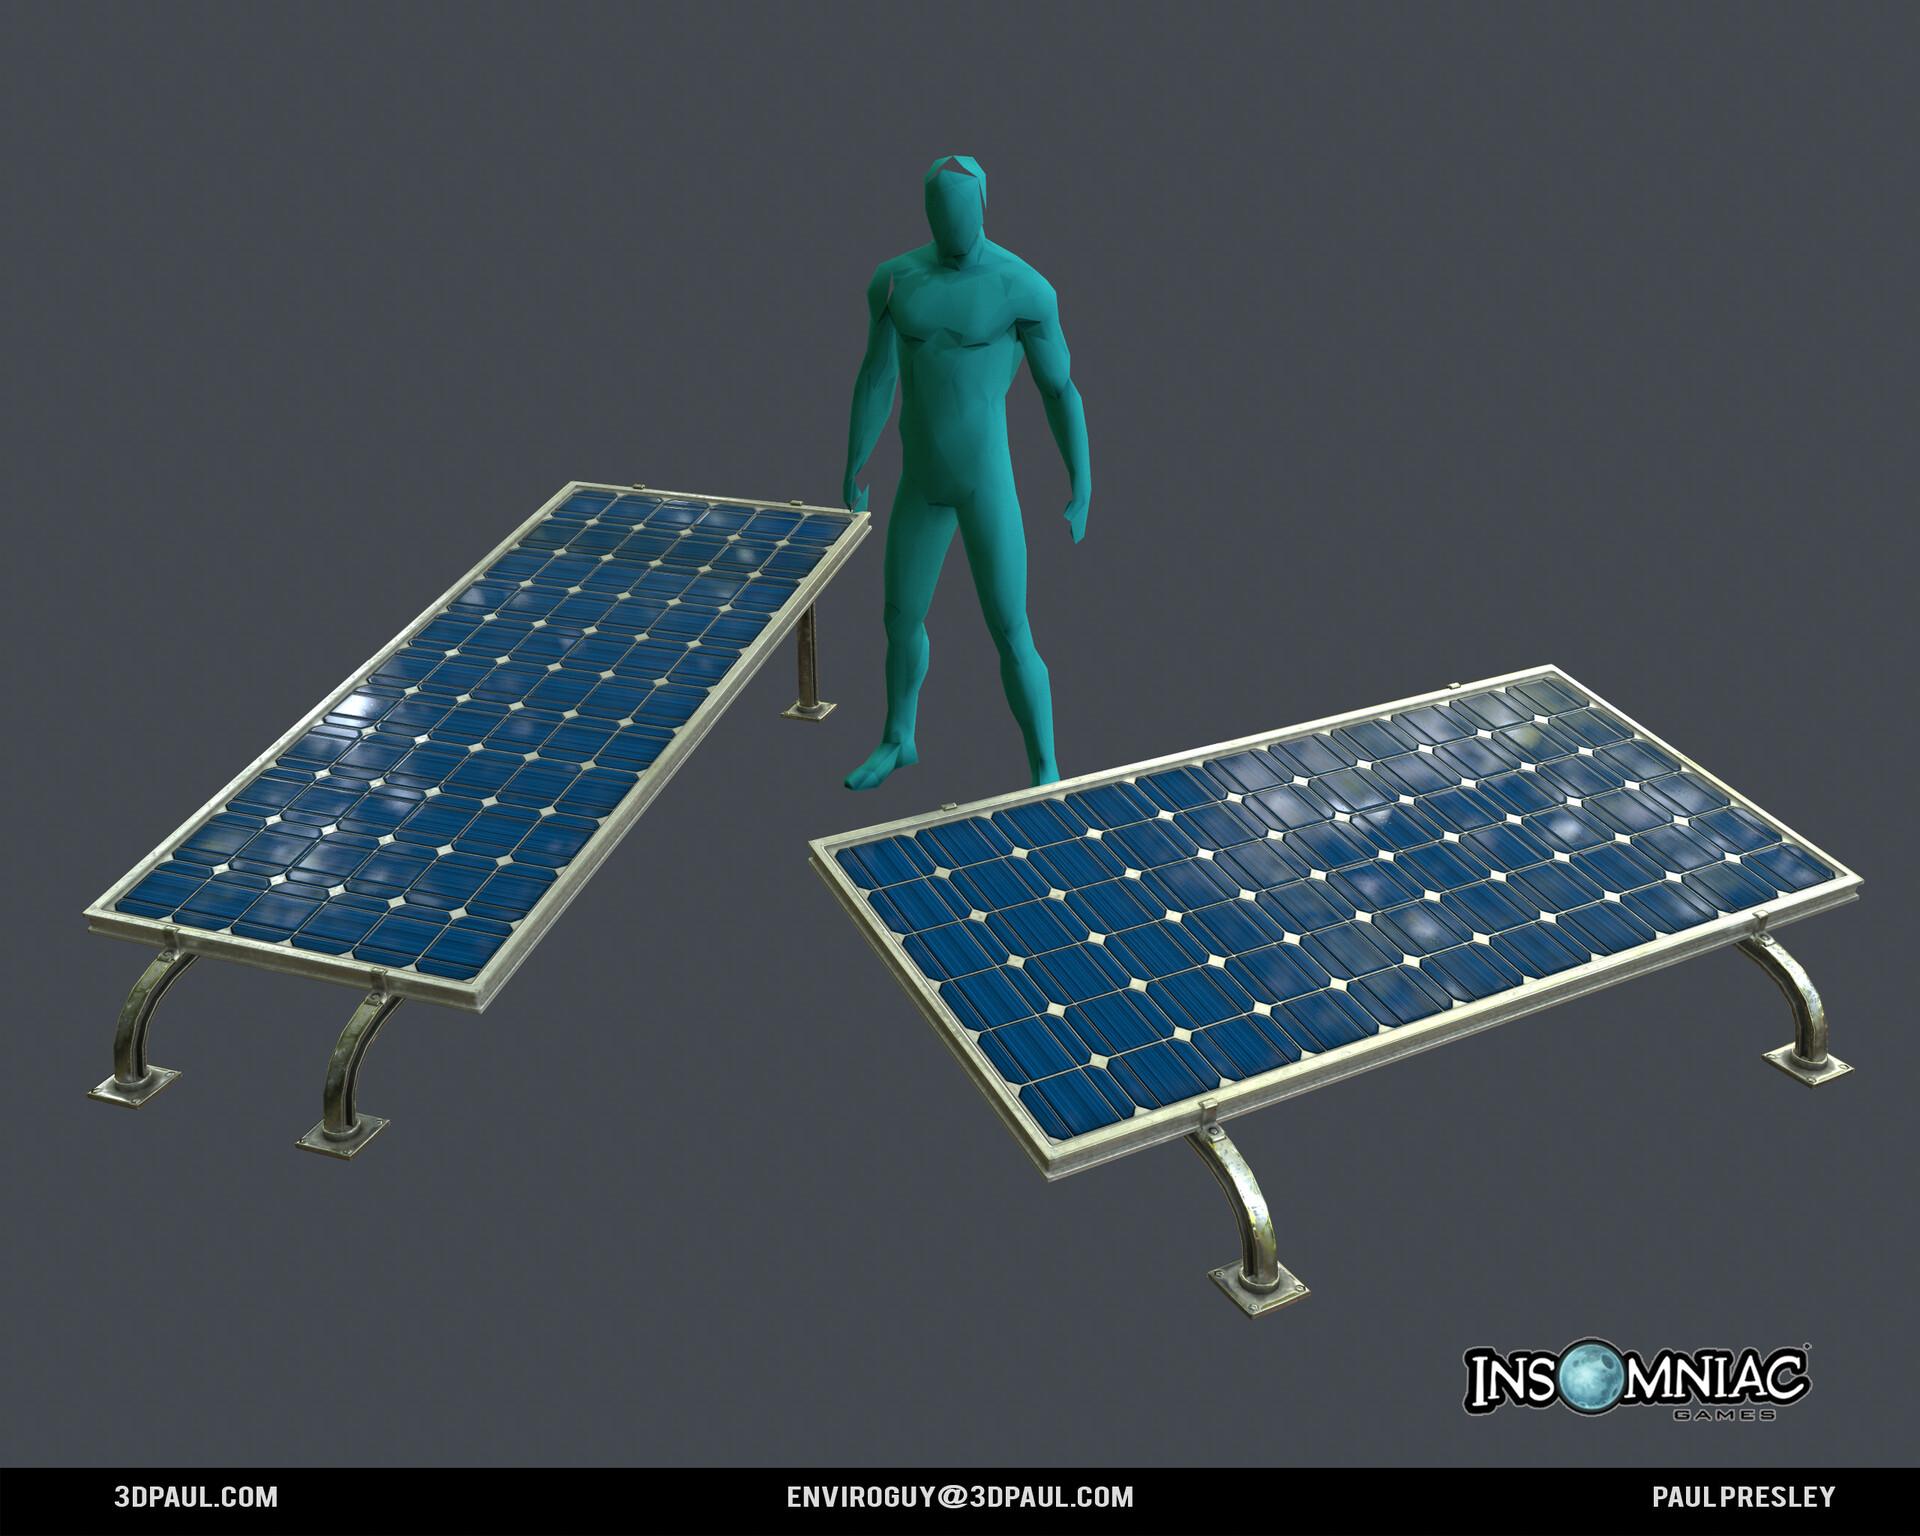 Paul presley ig spider 15 solar